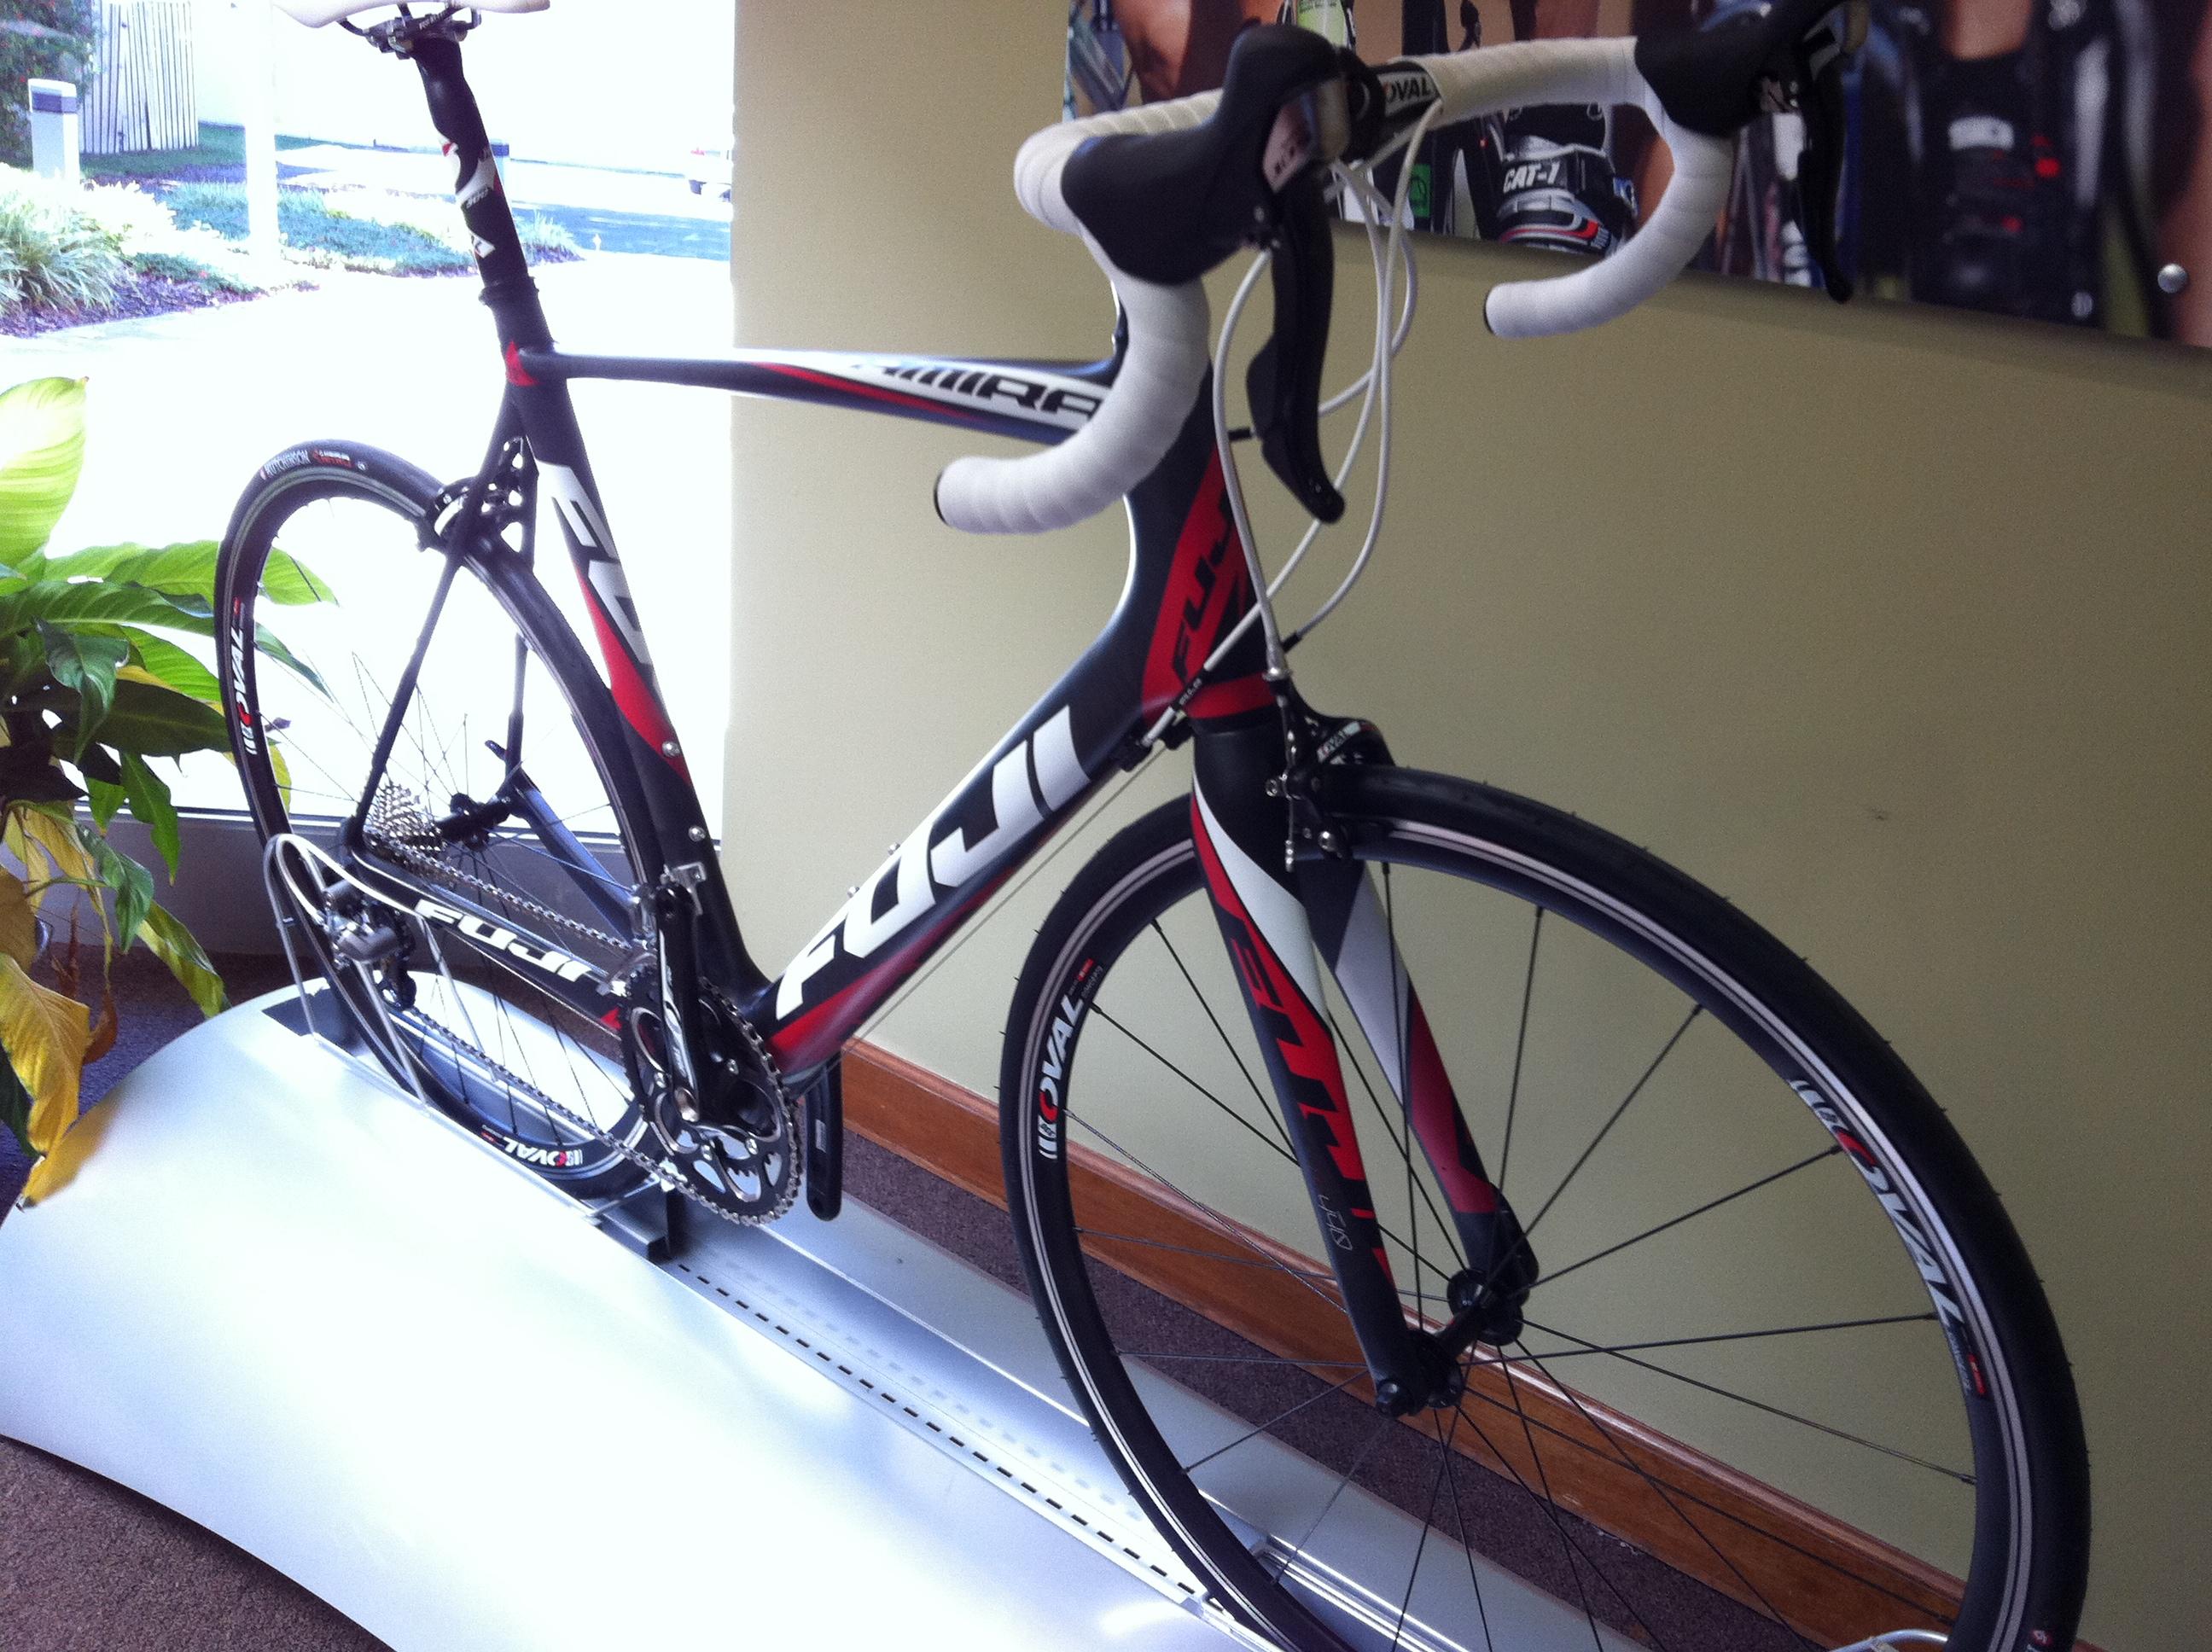 Product Profile New 2012 Fuji Bikes Performance Bicycle Blog